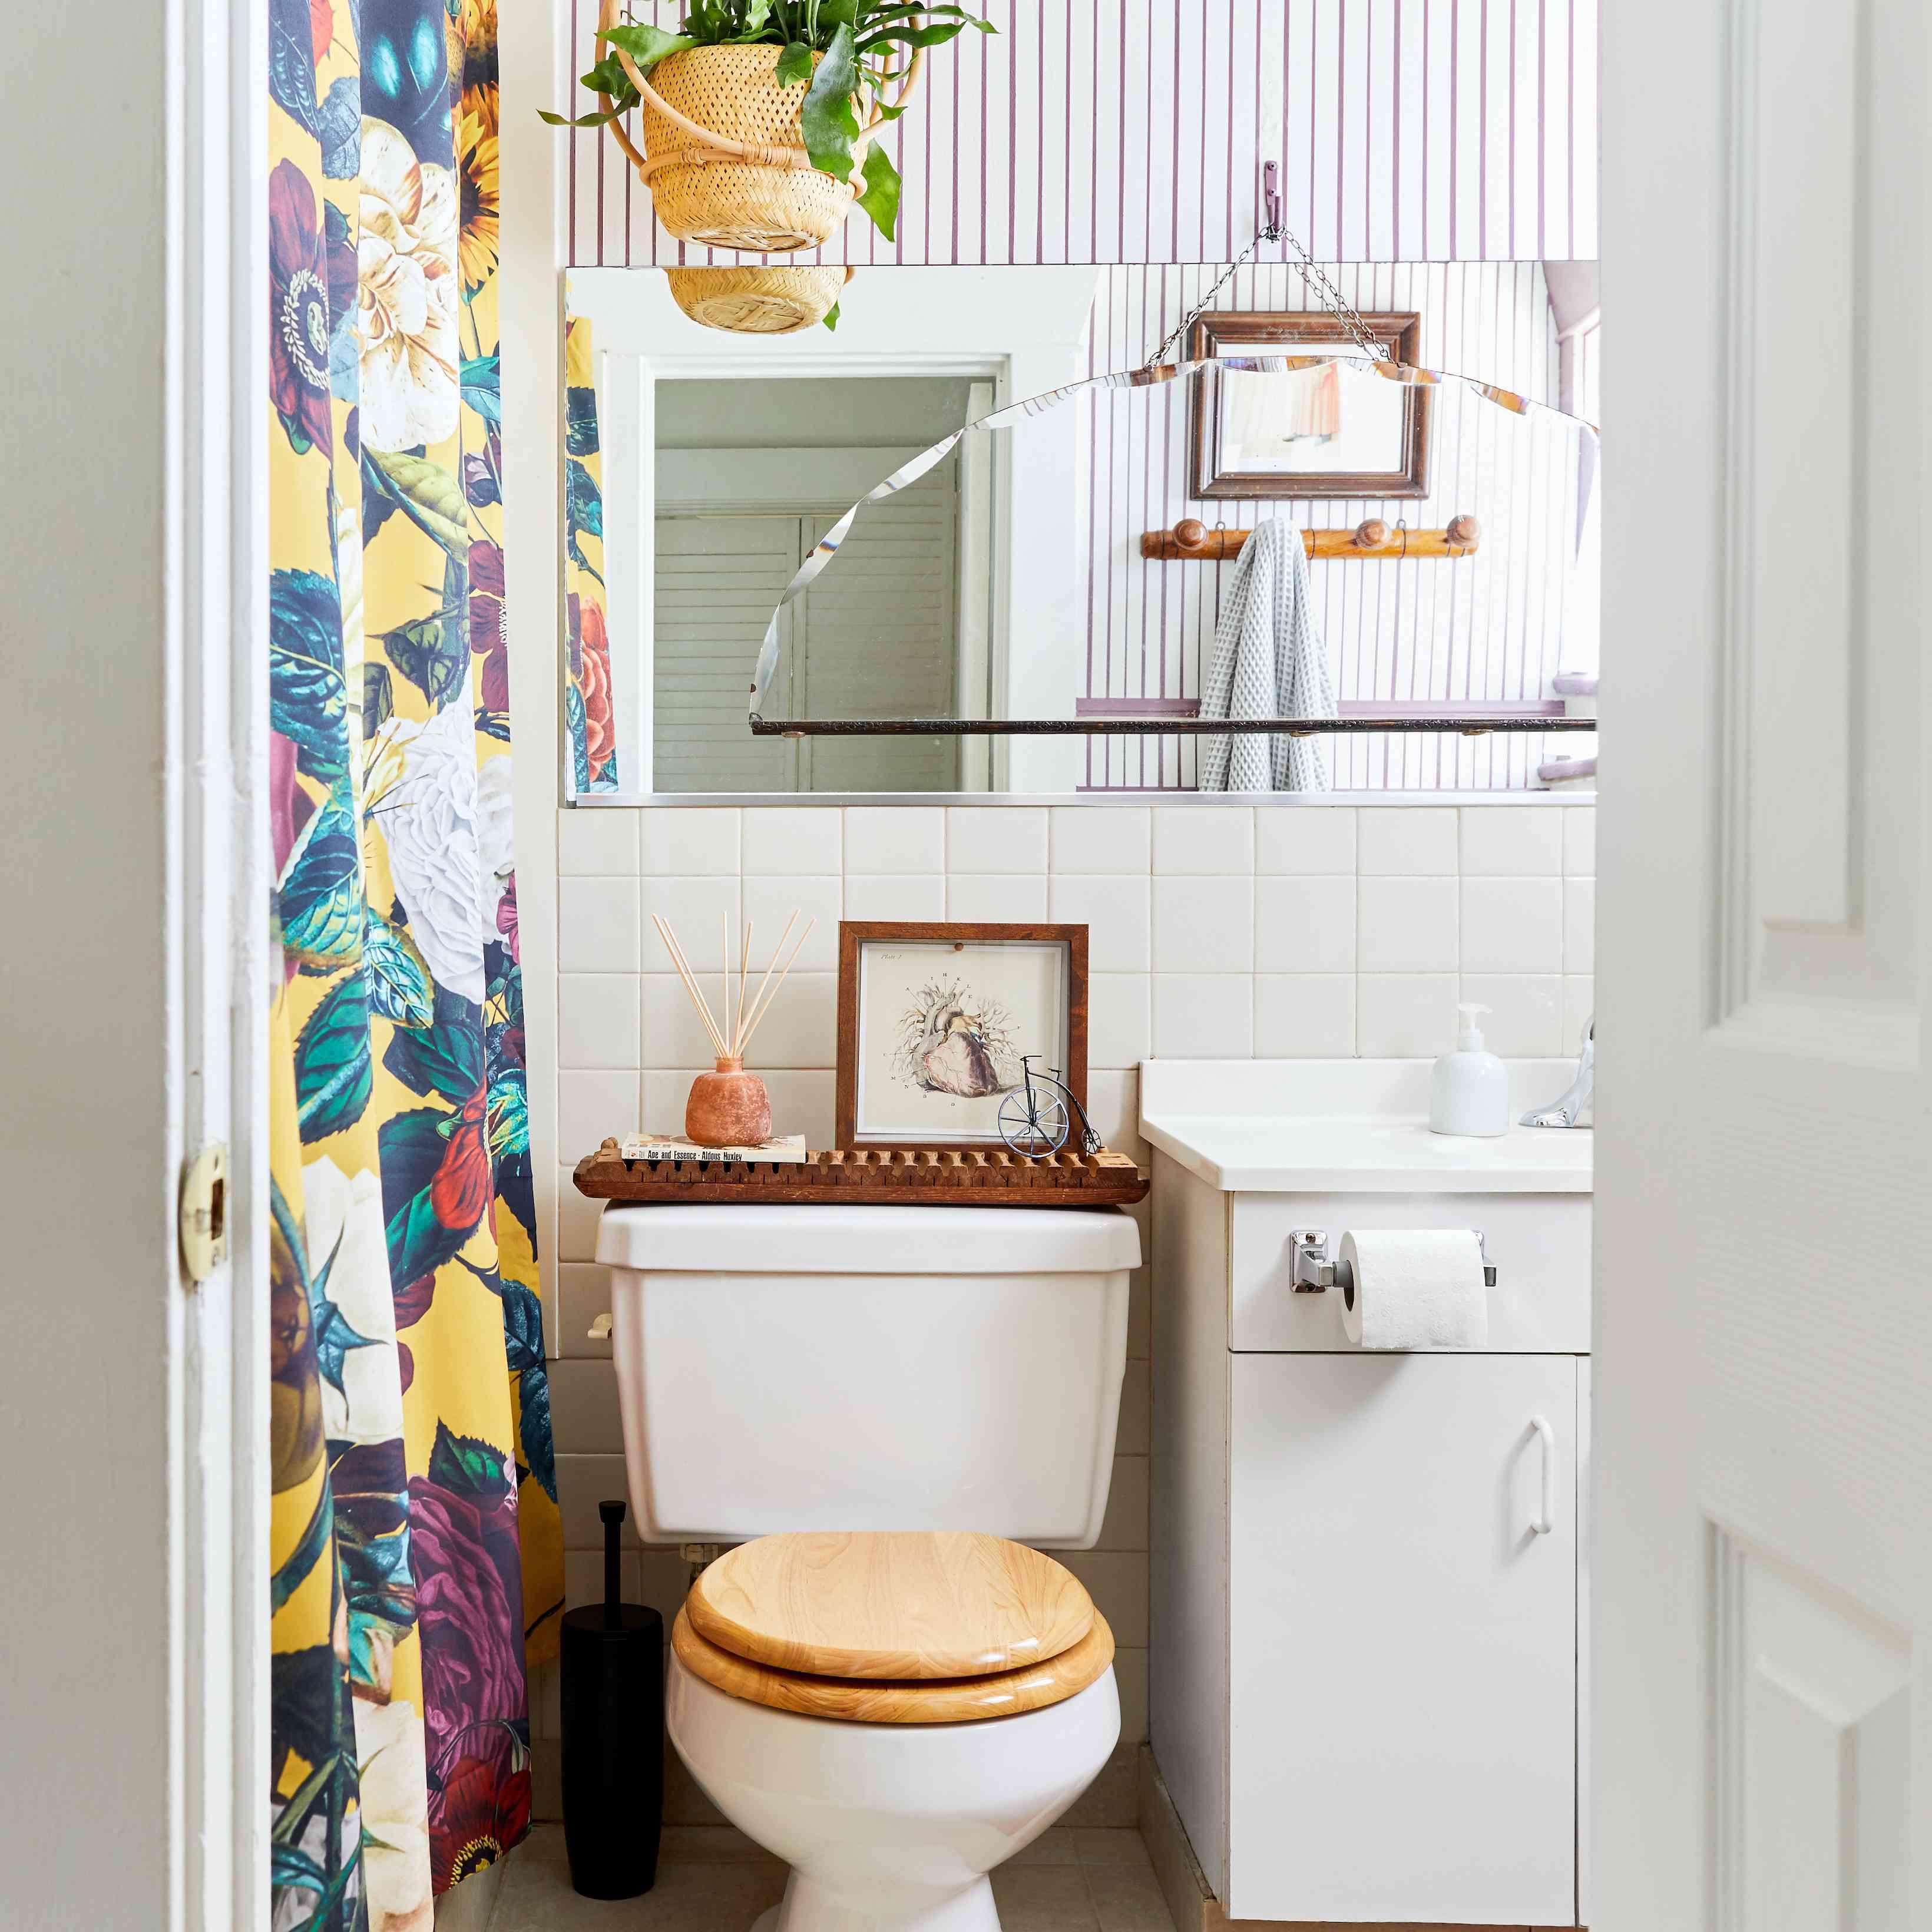 Vintage rental bathroom with eclectic decor